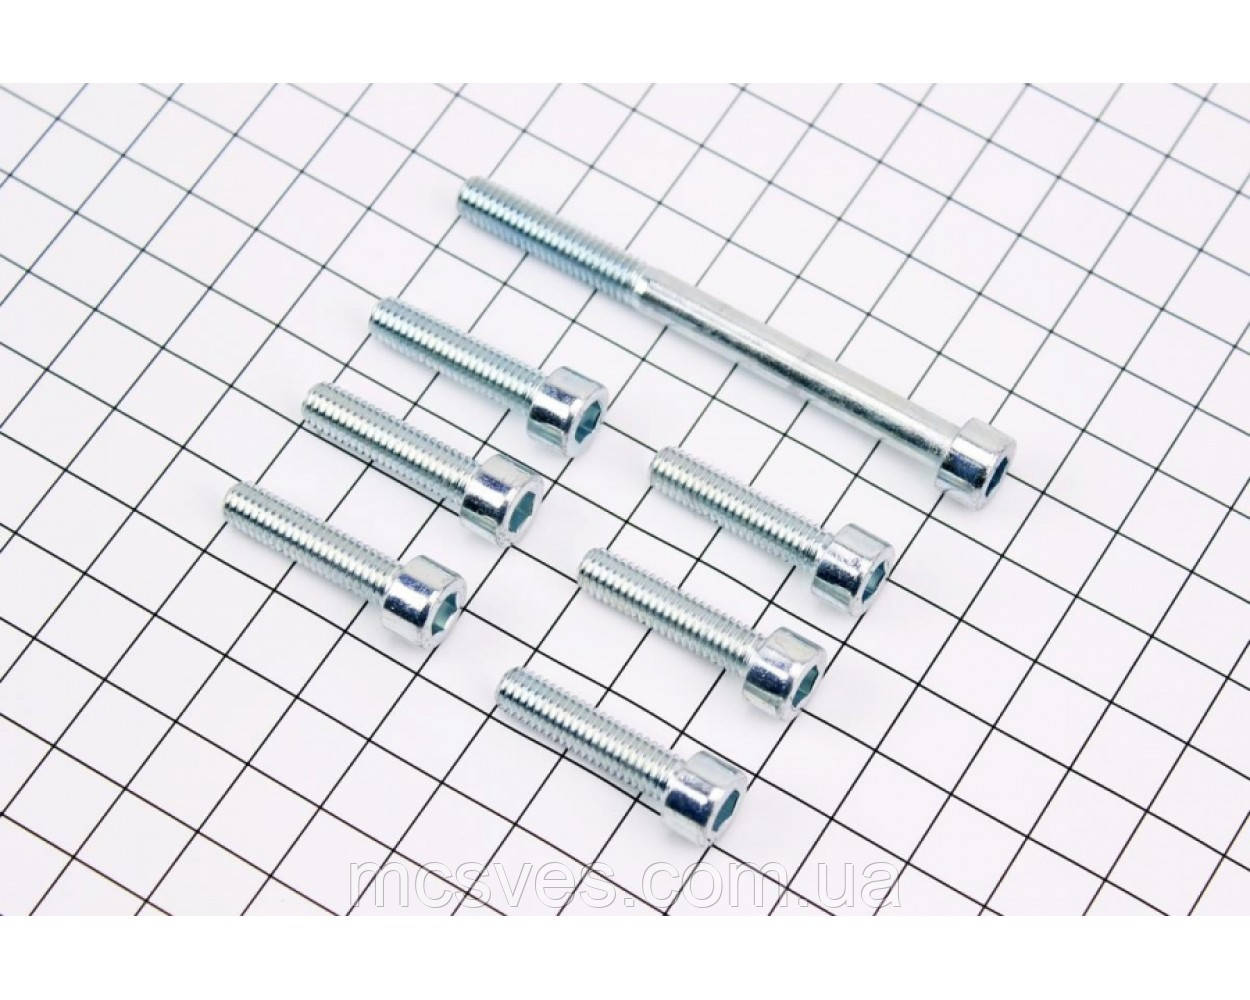 (Китай) Болт крепления крышки вариатора Suzuki AD 50 - к-кт 7шт 1 / 2